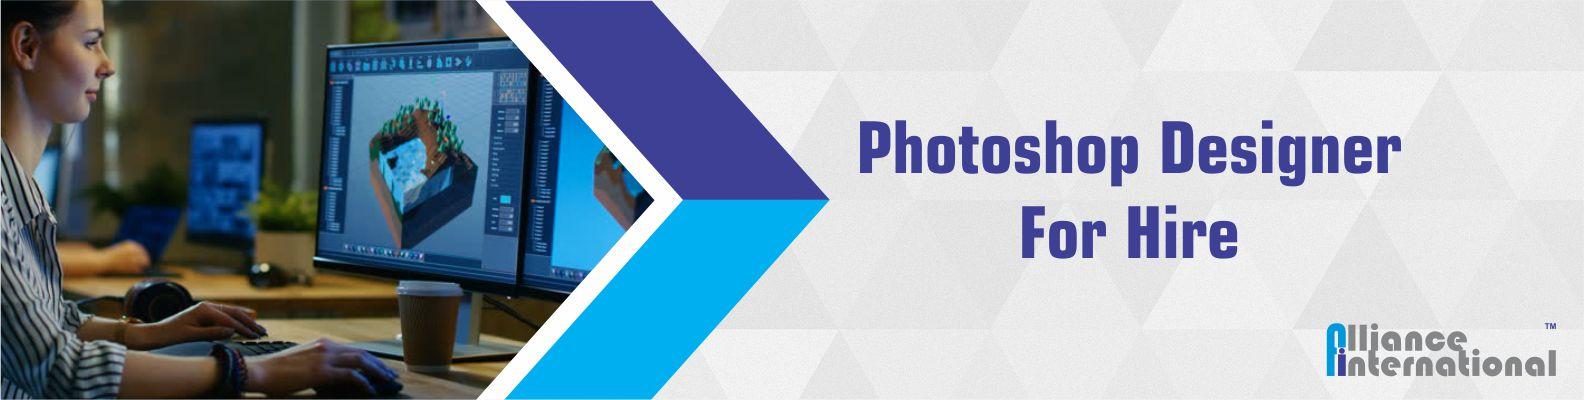 Photoshop Designer For Hire